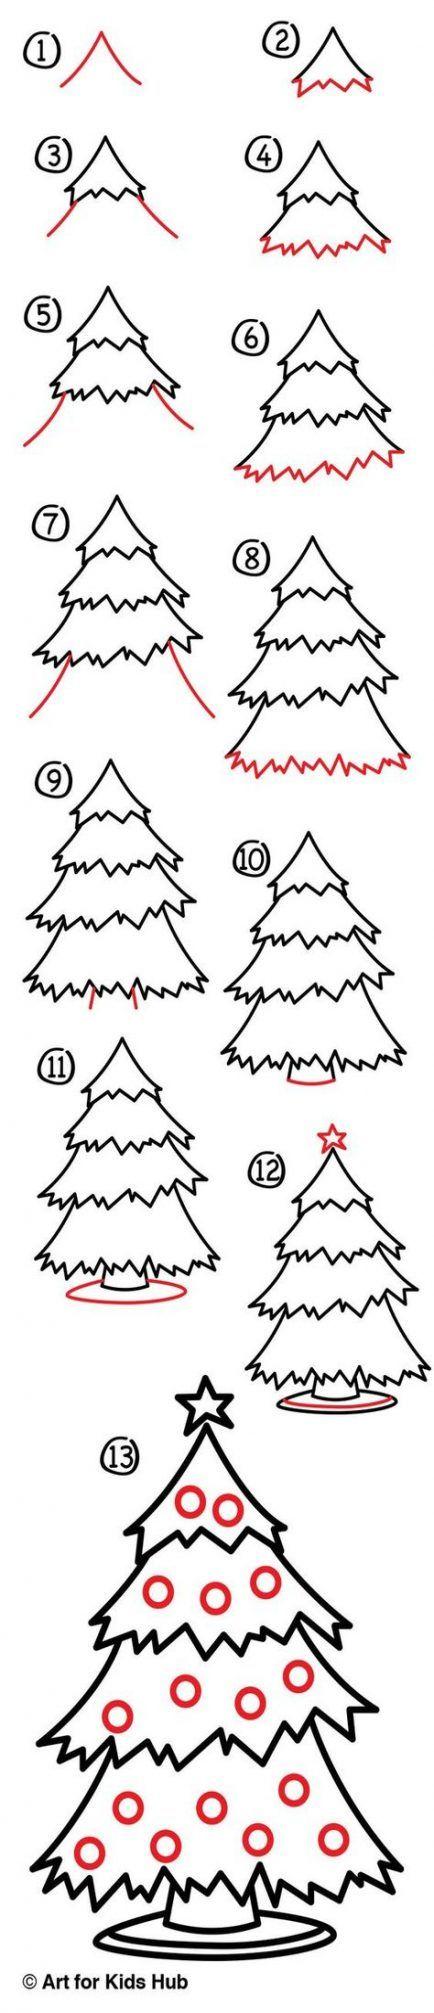 Super Painting Rocks Tutorial To Draw Ideas Art For Kids Hub Christmas Drawing Christmas Tree Art